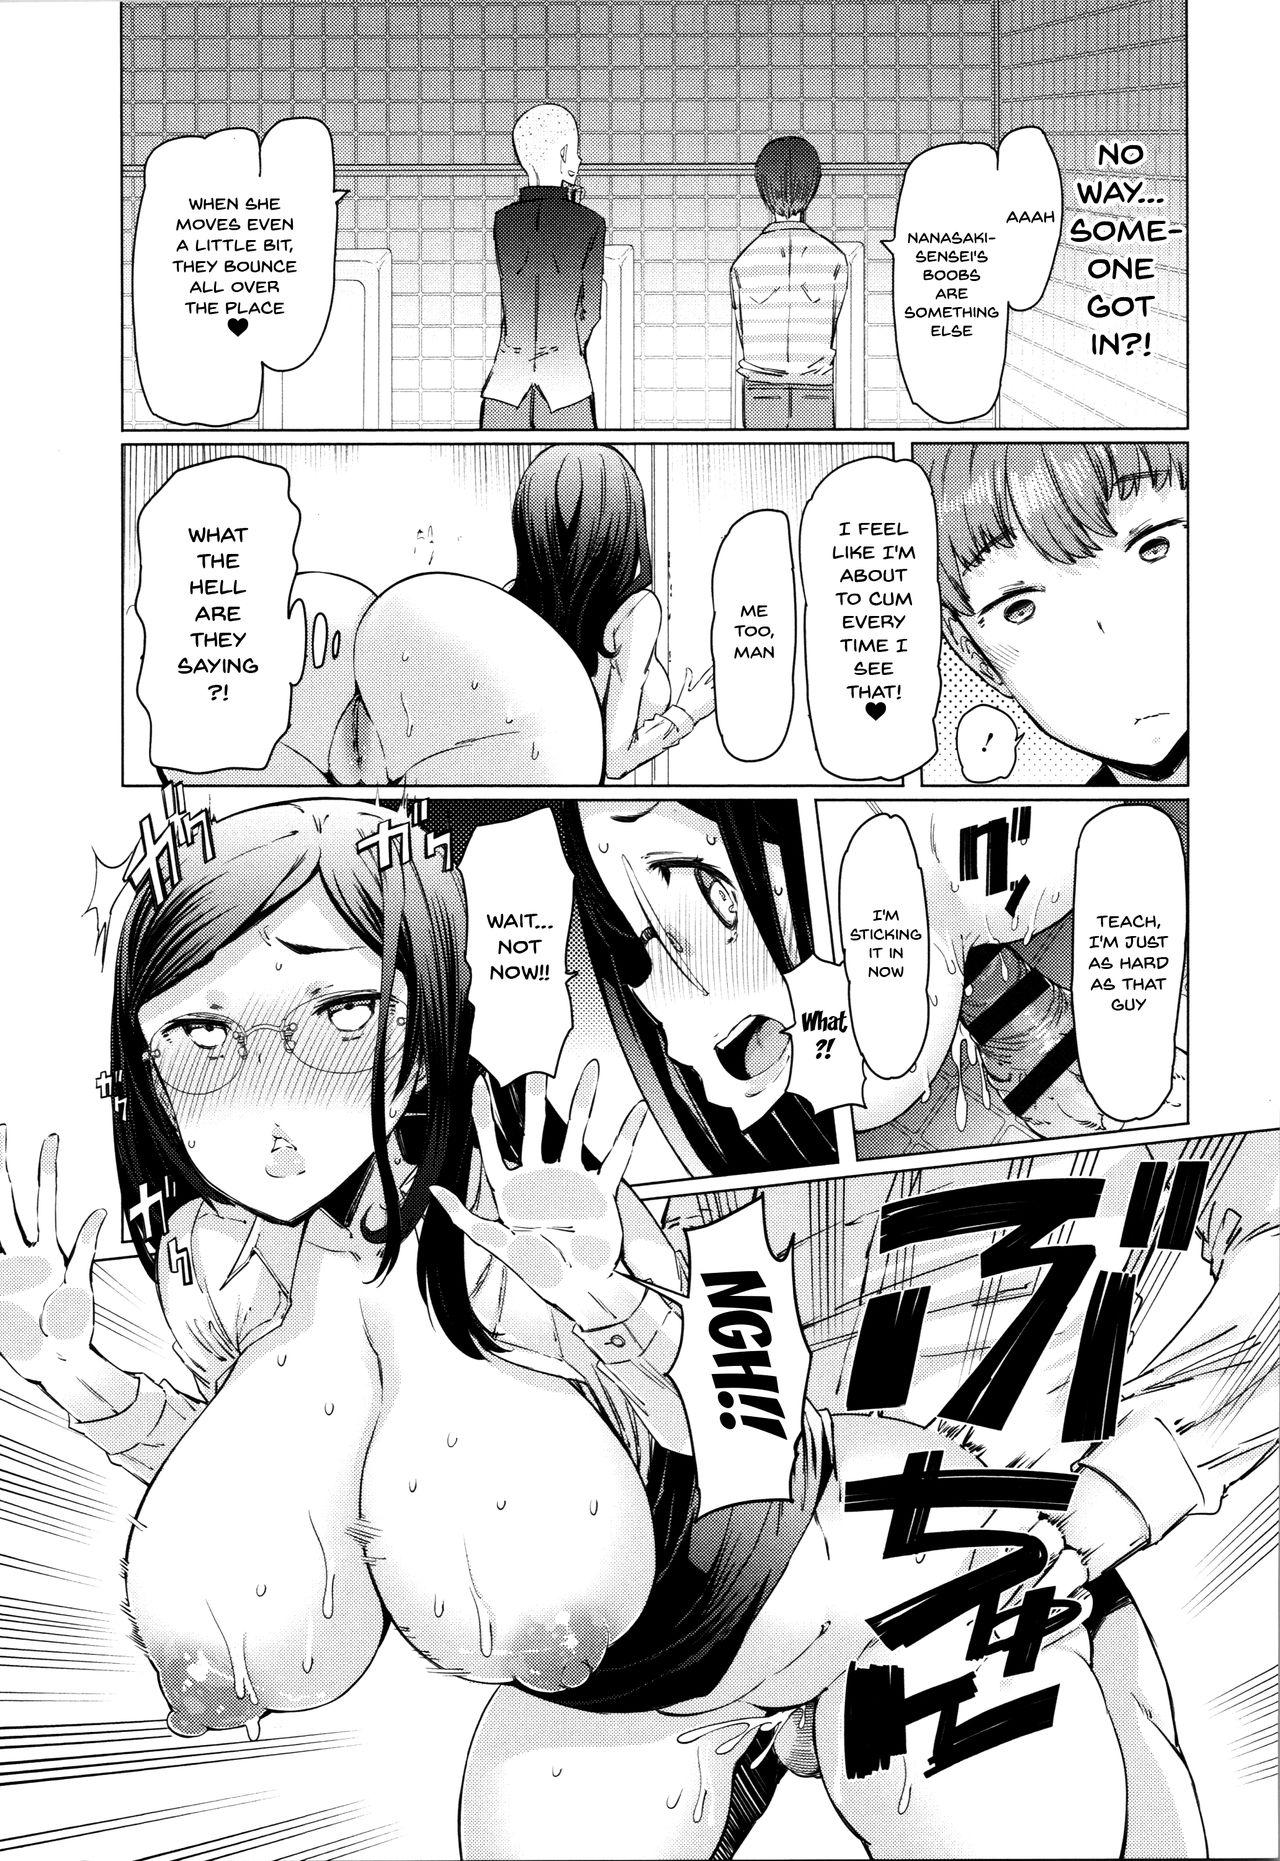 Hitozuma ga Ero Sugite Shigoto ni Naranai! | These Housewives Are Too Lewd I Can't Help It! Ch.1-3 52